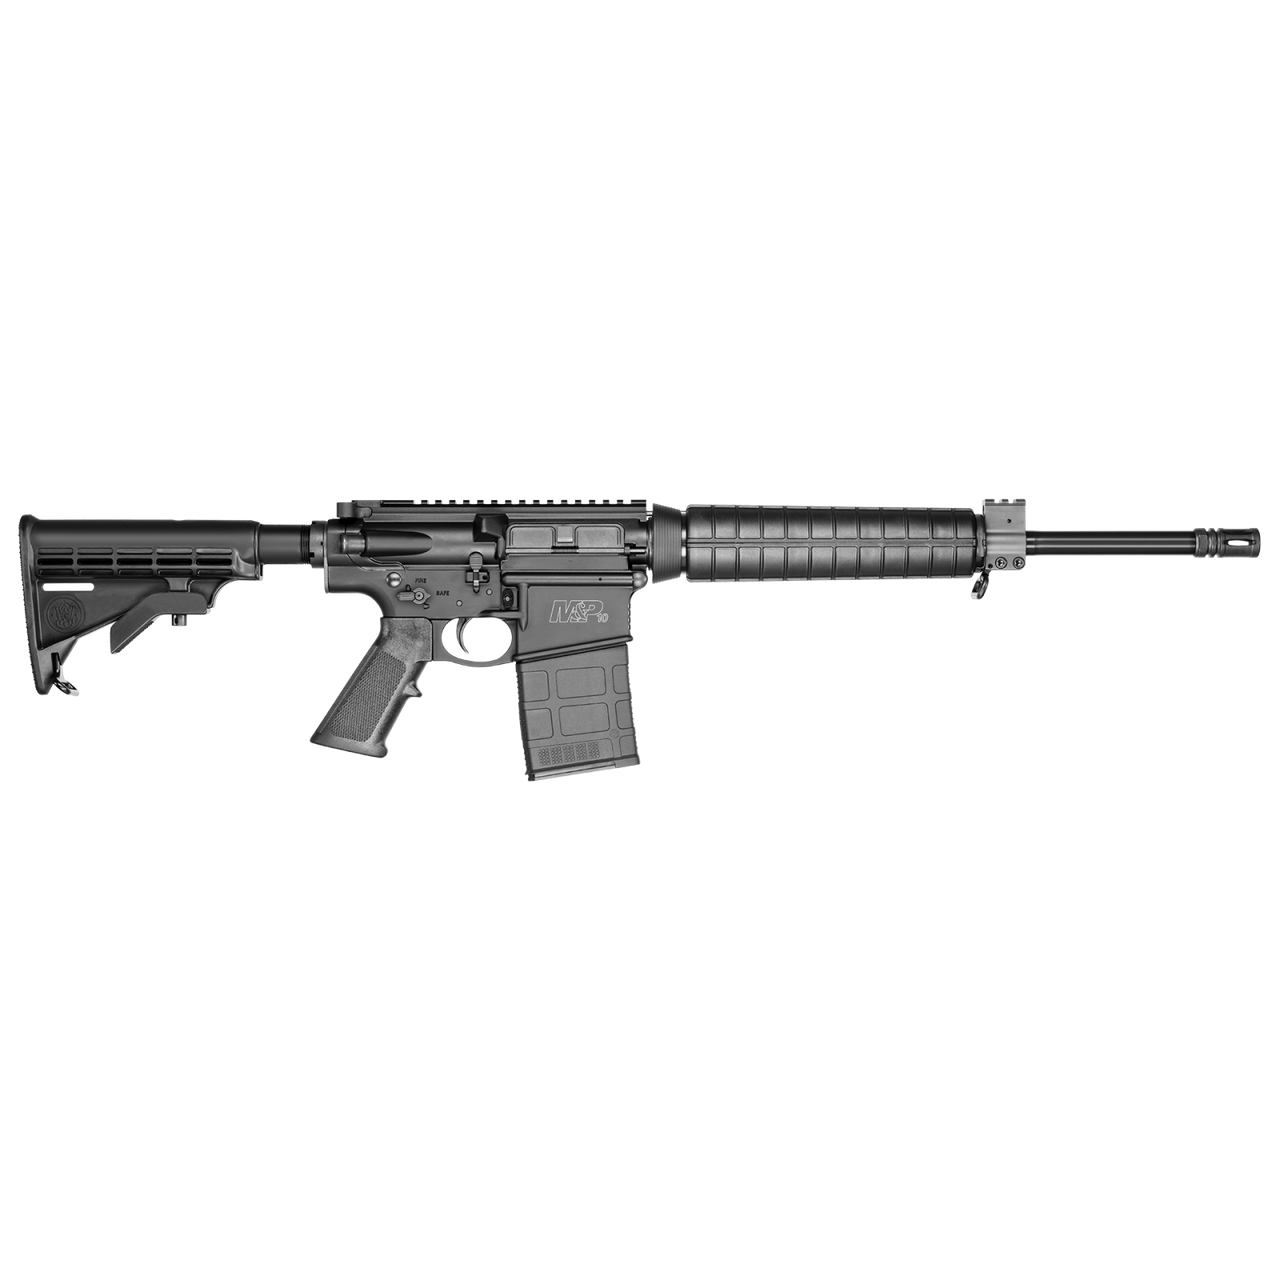 Smith & Wesson M&P10 Sport CALIFORNIA LEGAL - .308/7.62x51